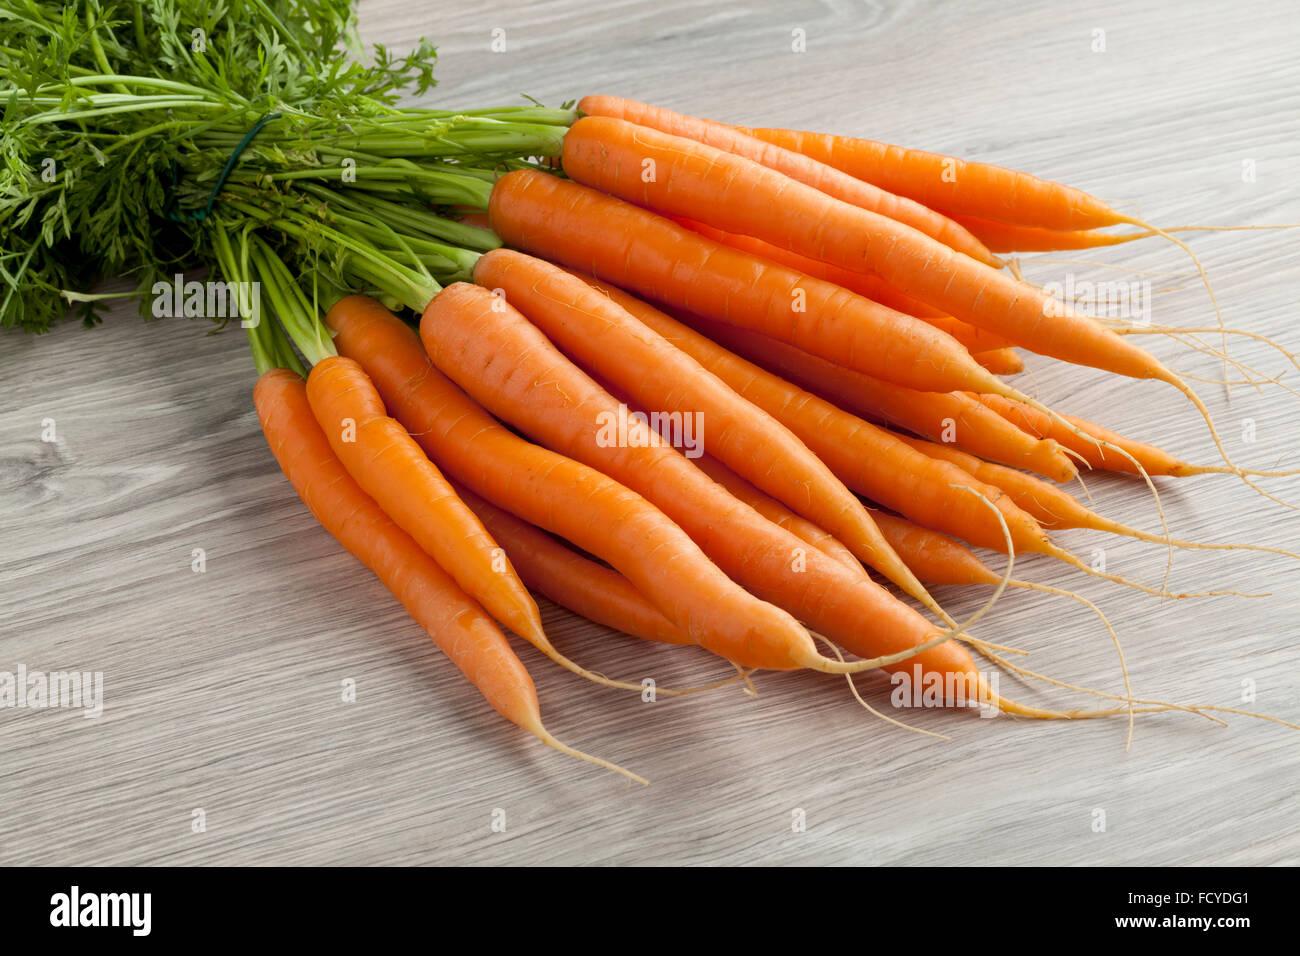 Des tas de carottes orange Photo Stock